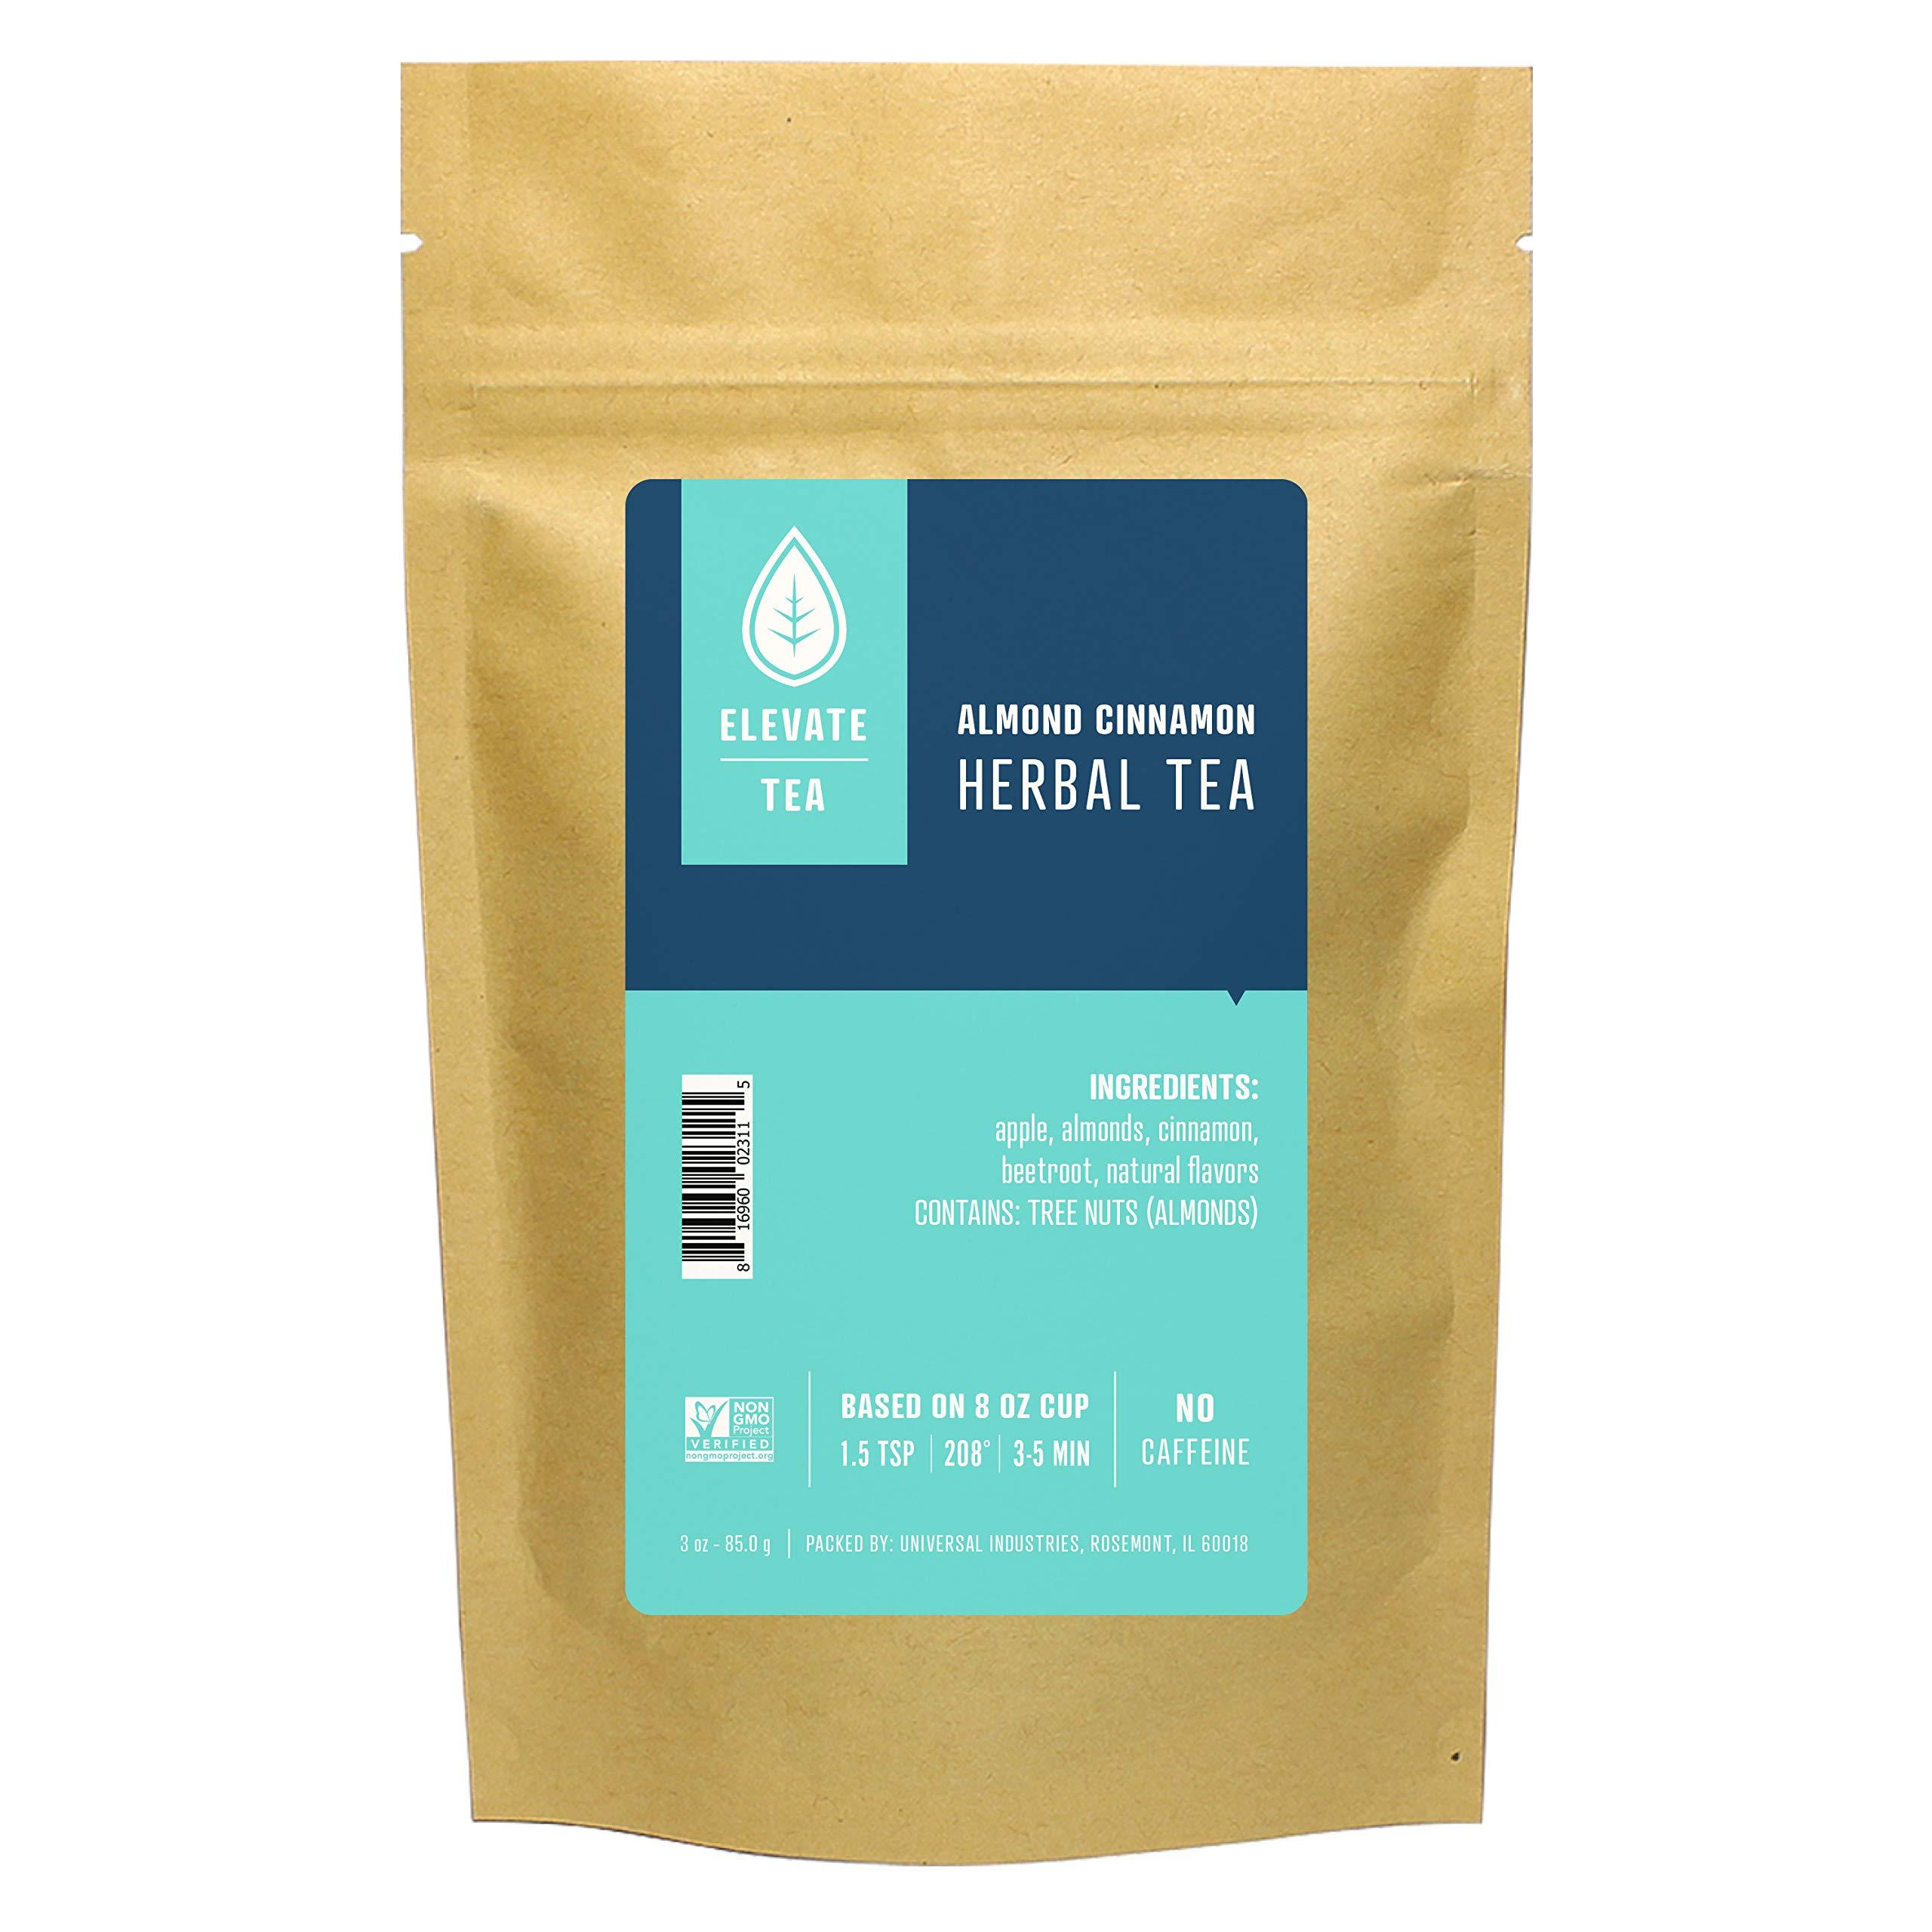 Elevate Tea APPLE CINNAMON HERBAL TEA, 27 servings, 3 oz Pouch, Caffeine Level: None, Single Unit, 3 oz